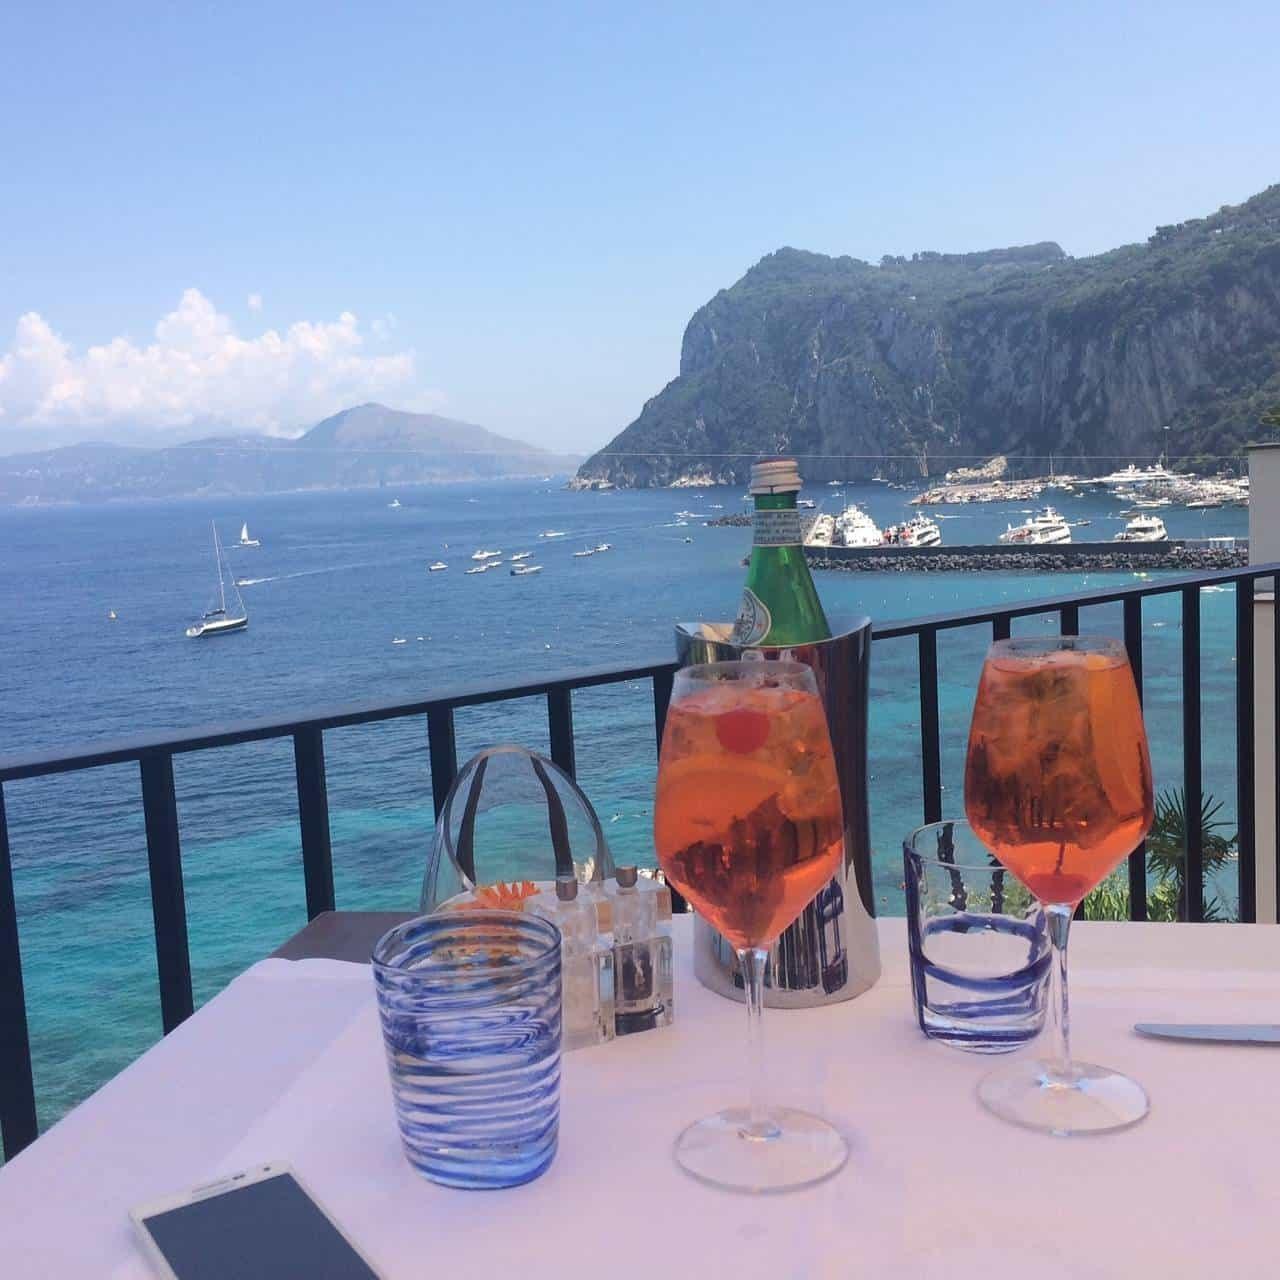 JK Place in Capri